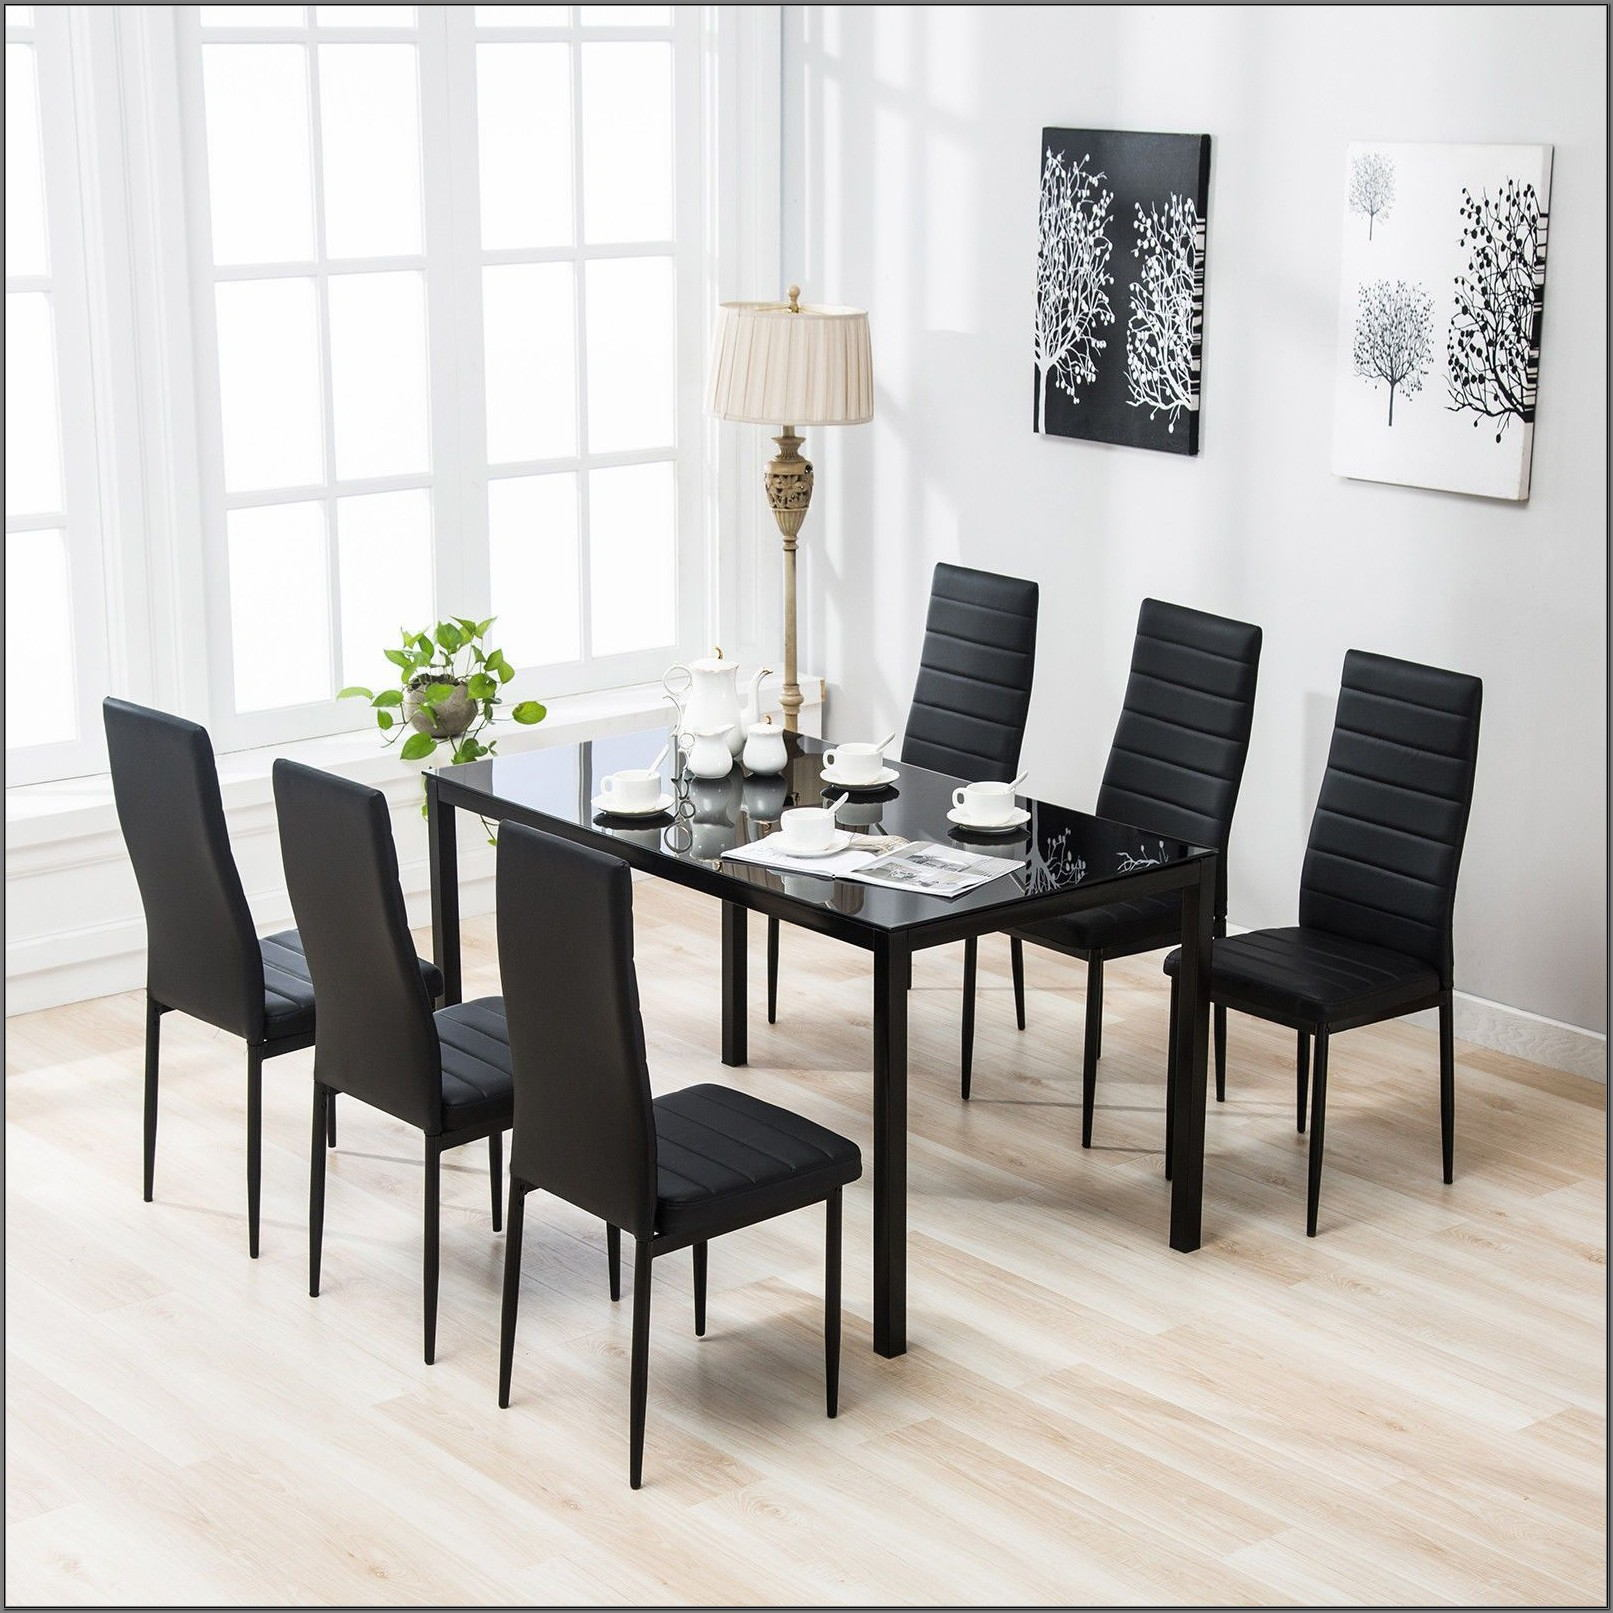 7 Piece Glass Dining Room Set